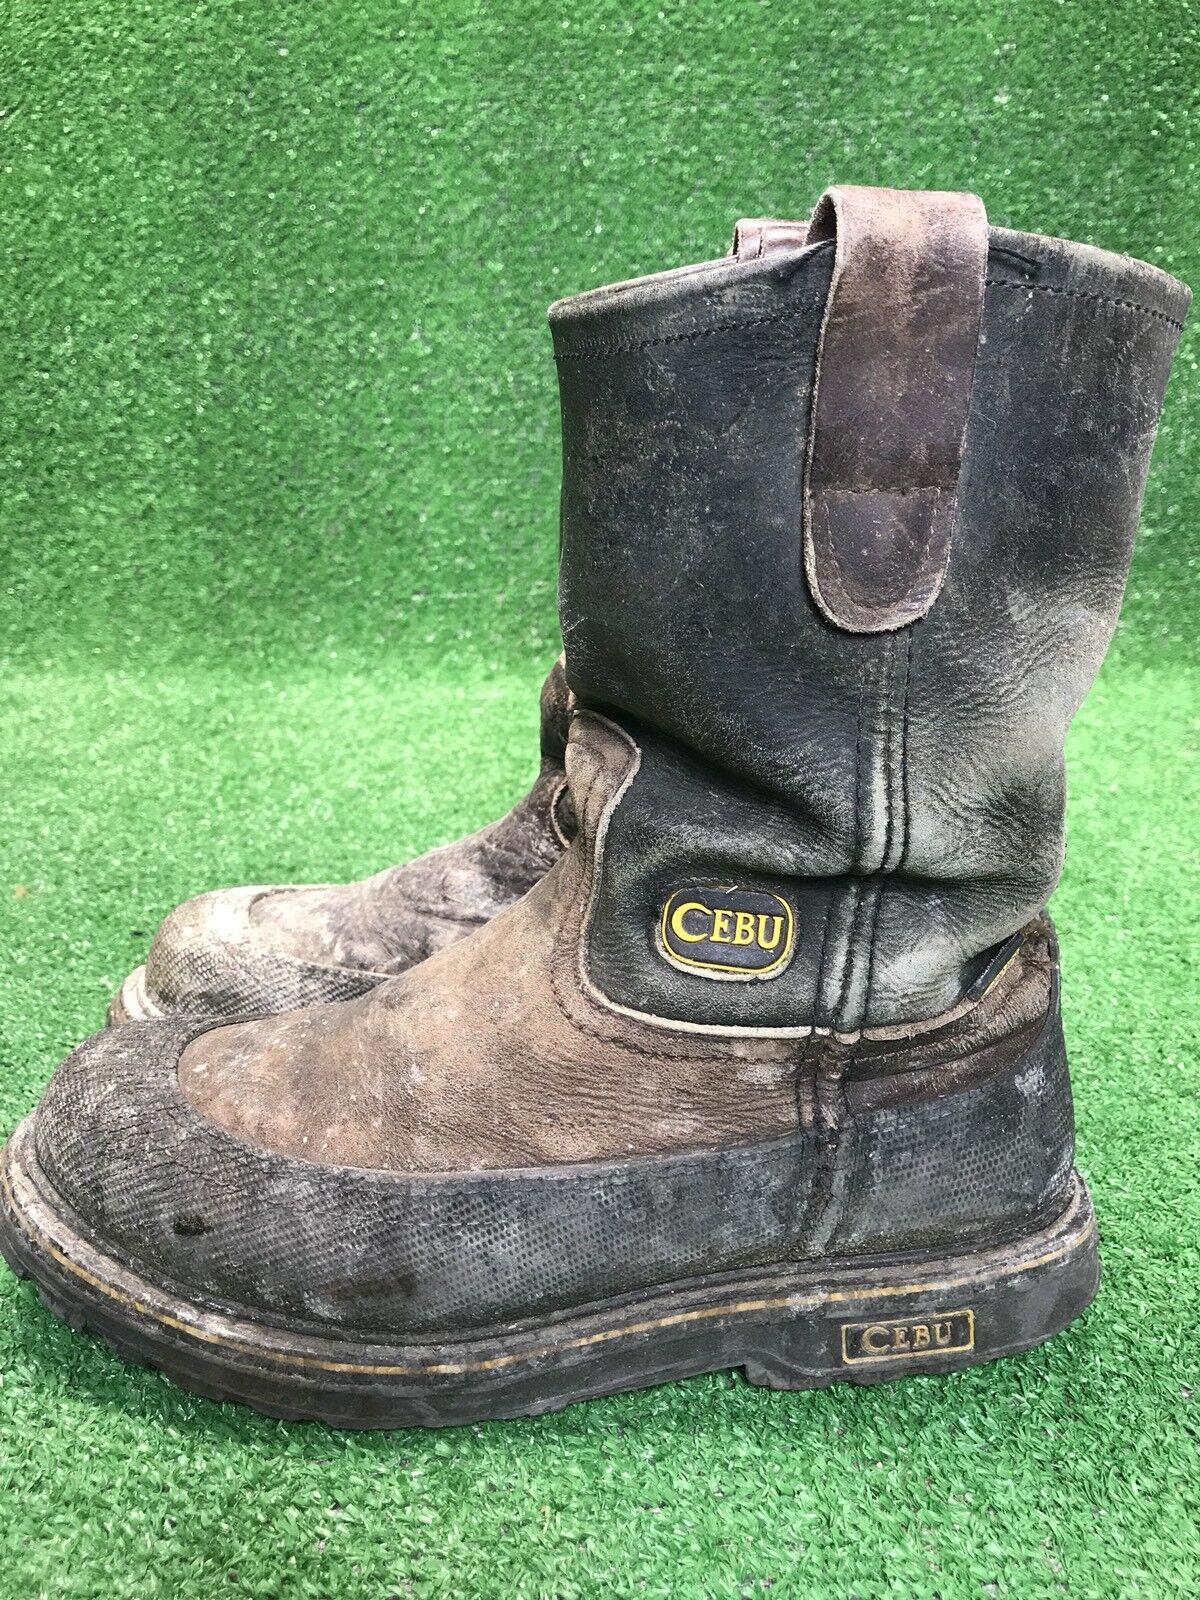 Cebu Mens Distressed Leather Steel Toe Brown Work Boots Men's 8